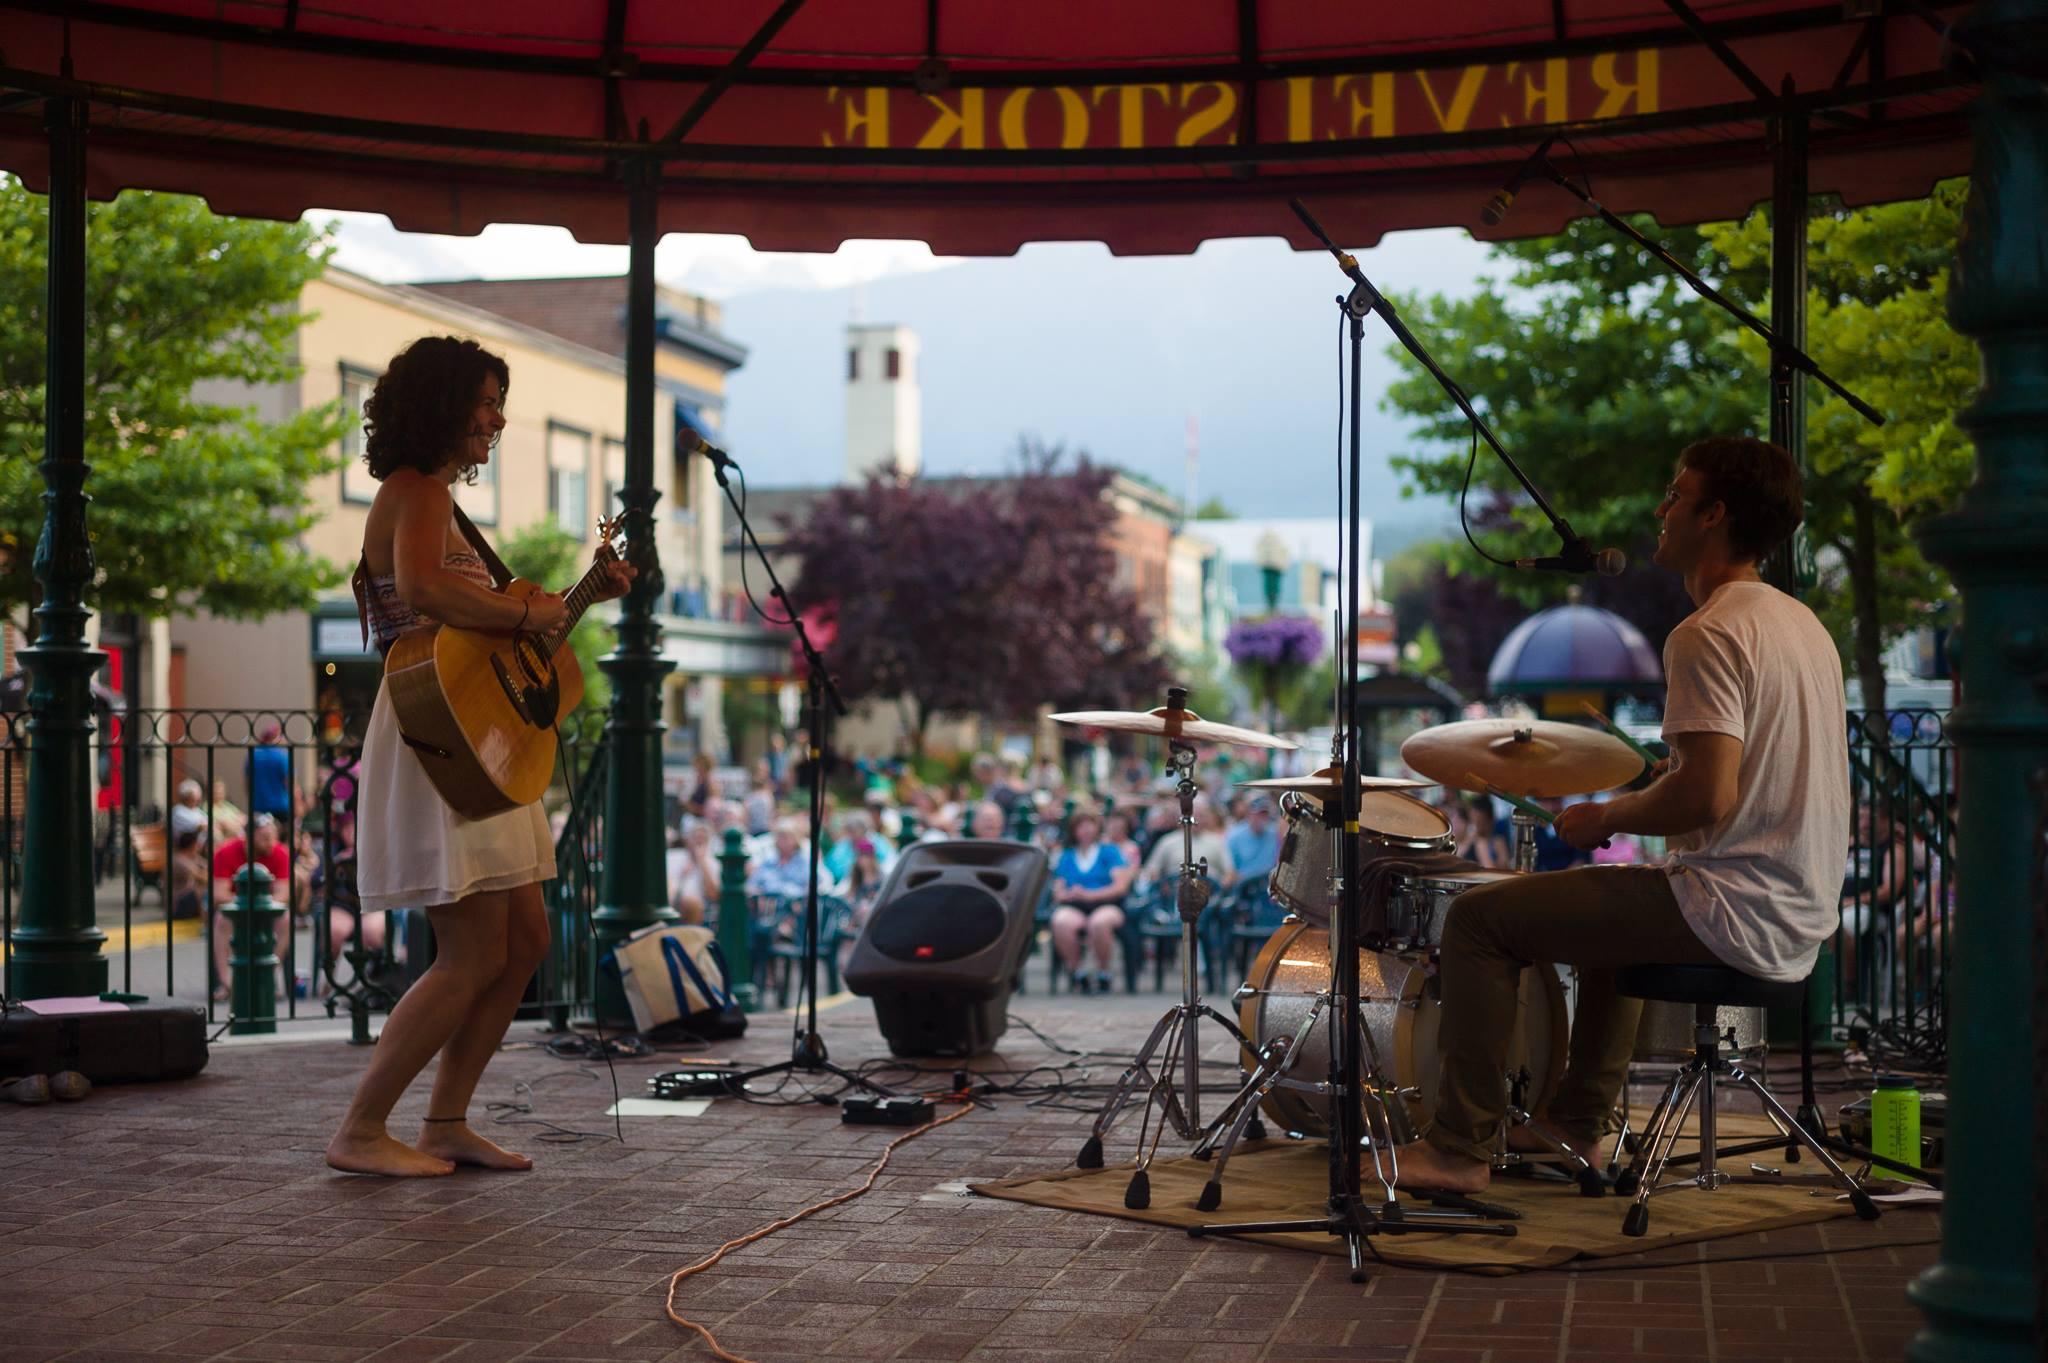 Revelstoke_Grizzly_Plaza_Music_Borja-Moncunill-(3).jpg